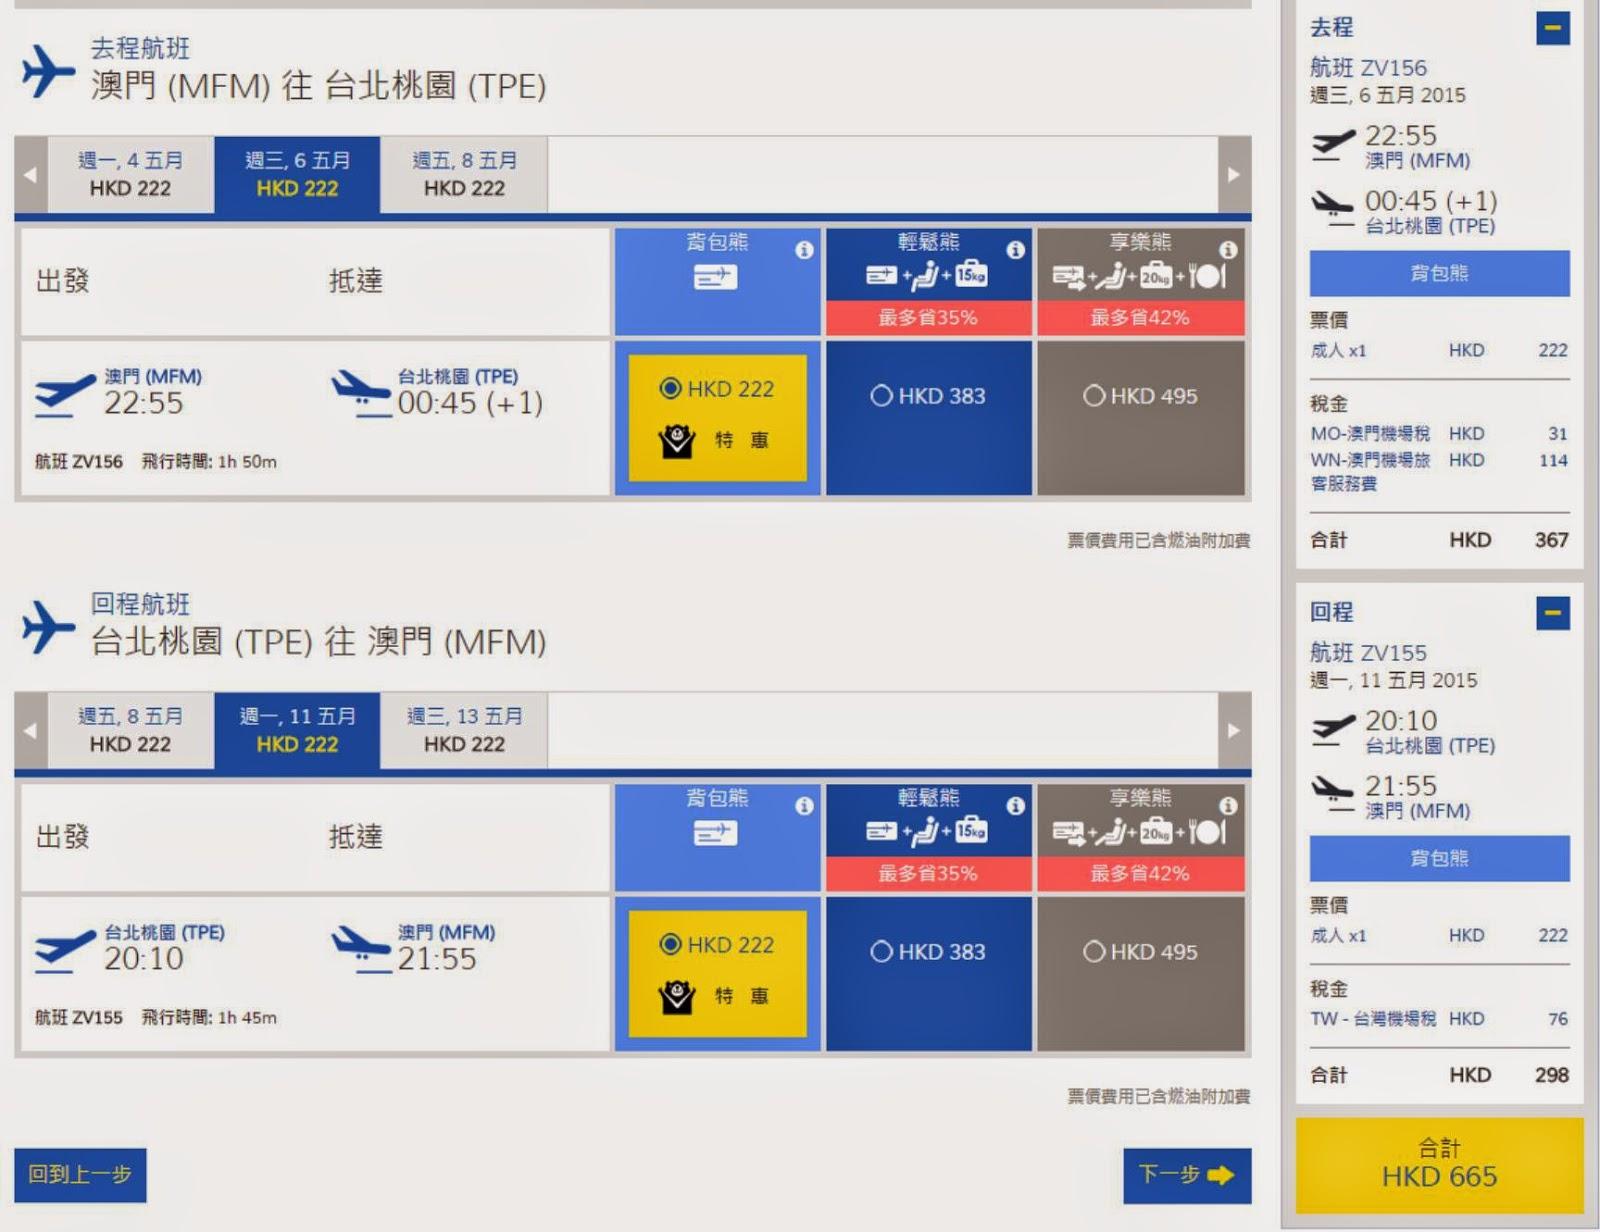 V Air威航澳門飛台北 單程機位 HK$222 (連稅約HK$367)、 來回機位 HK$444 (連稅約HK$665)